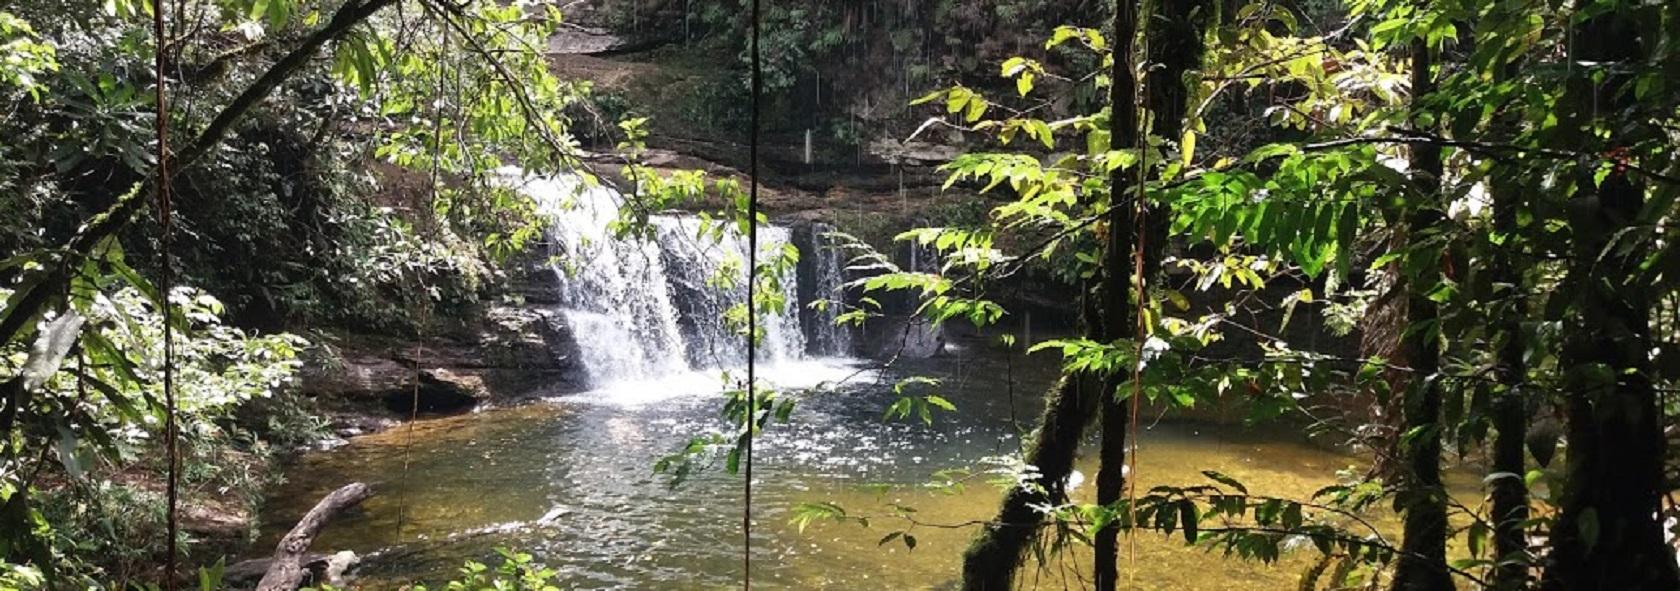 Well Putumayo End of the World Waterfall Blog